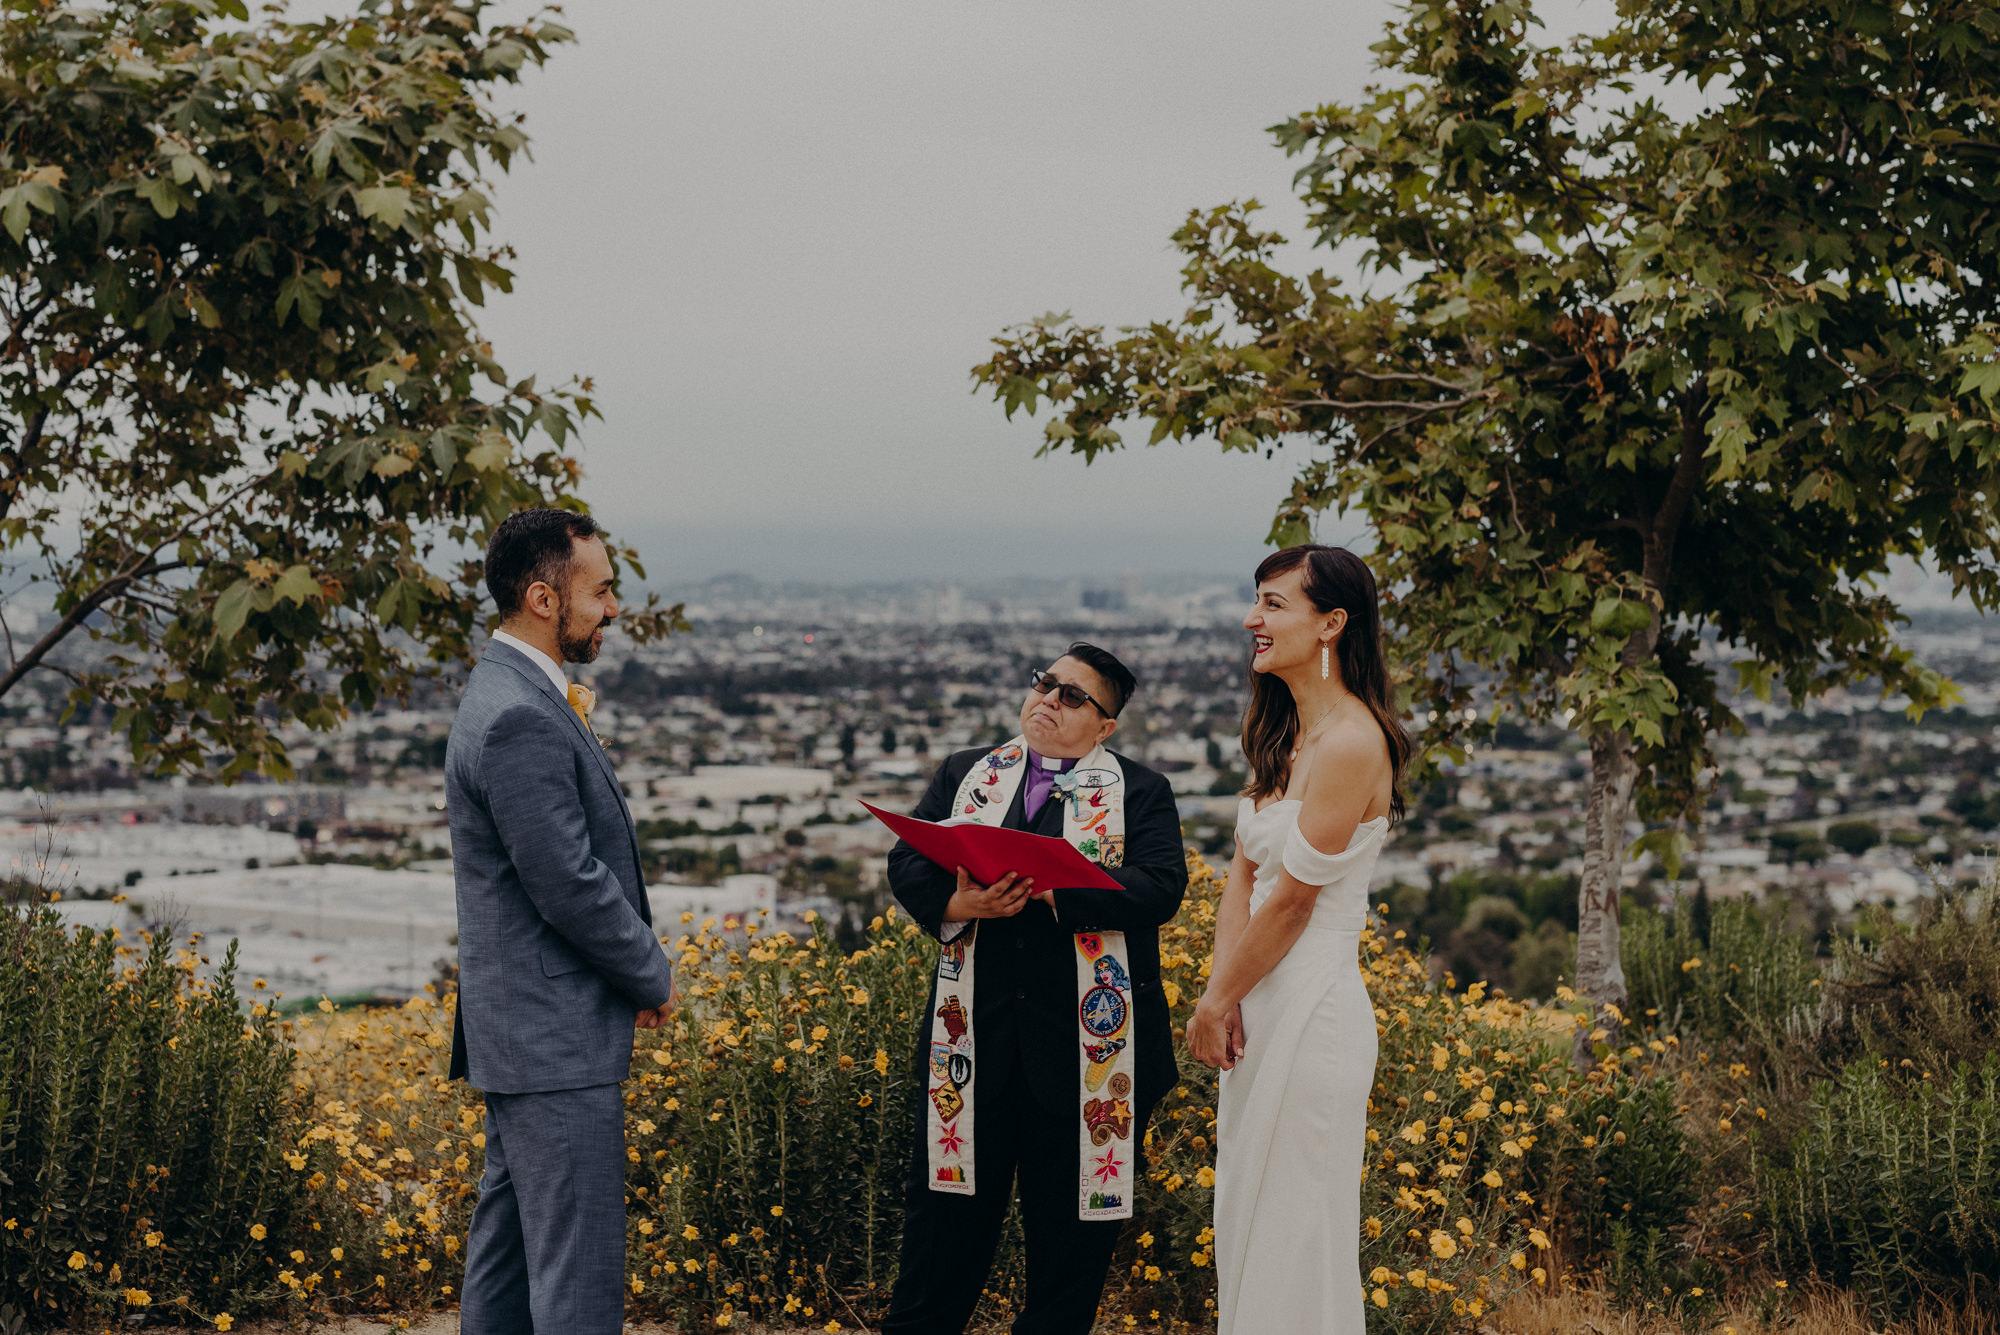 elopement photographer in los angeles - la wedding photographer - isaiahandtaylor.com-062.jpg